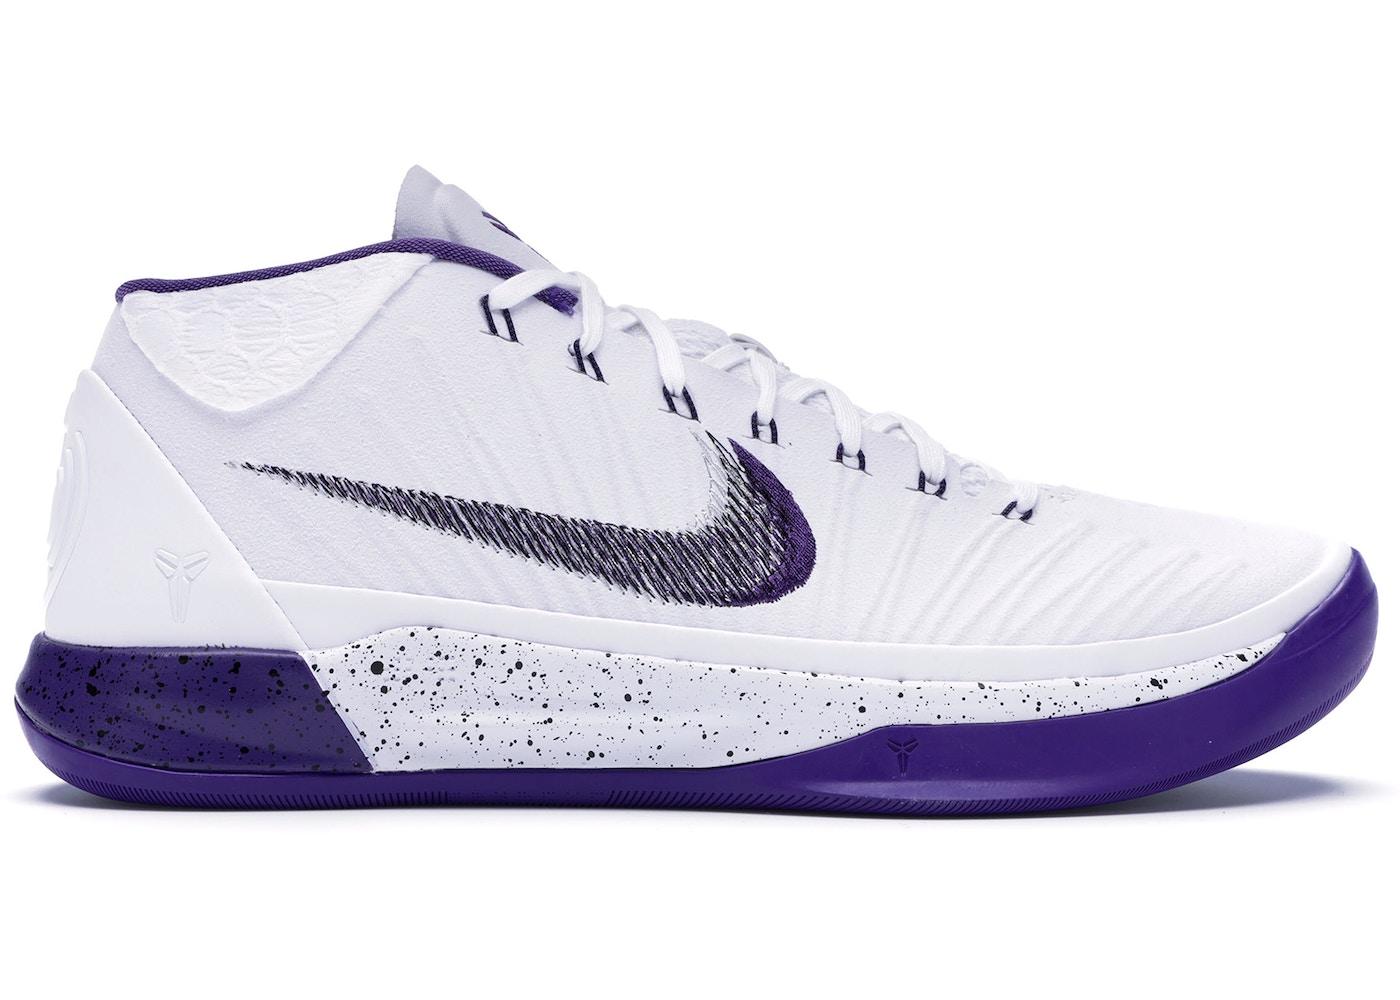 low priced 5aaf0 da9d0 Kobe A.D. Baseline White Court Purple